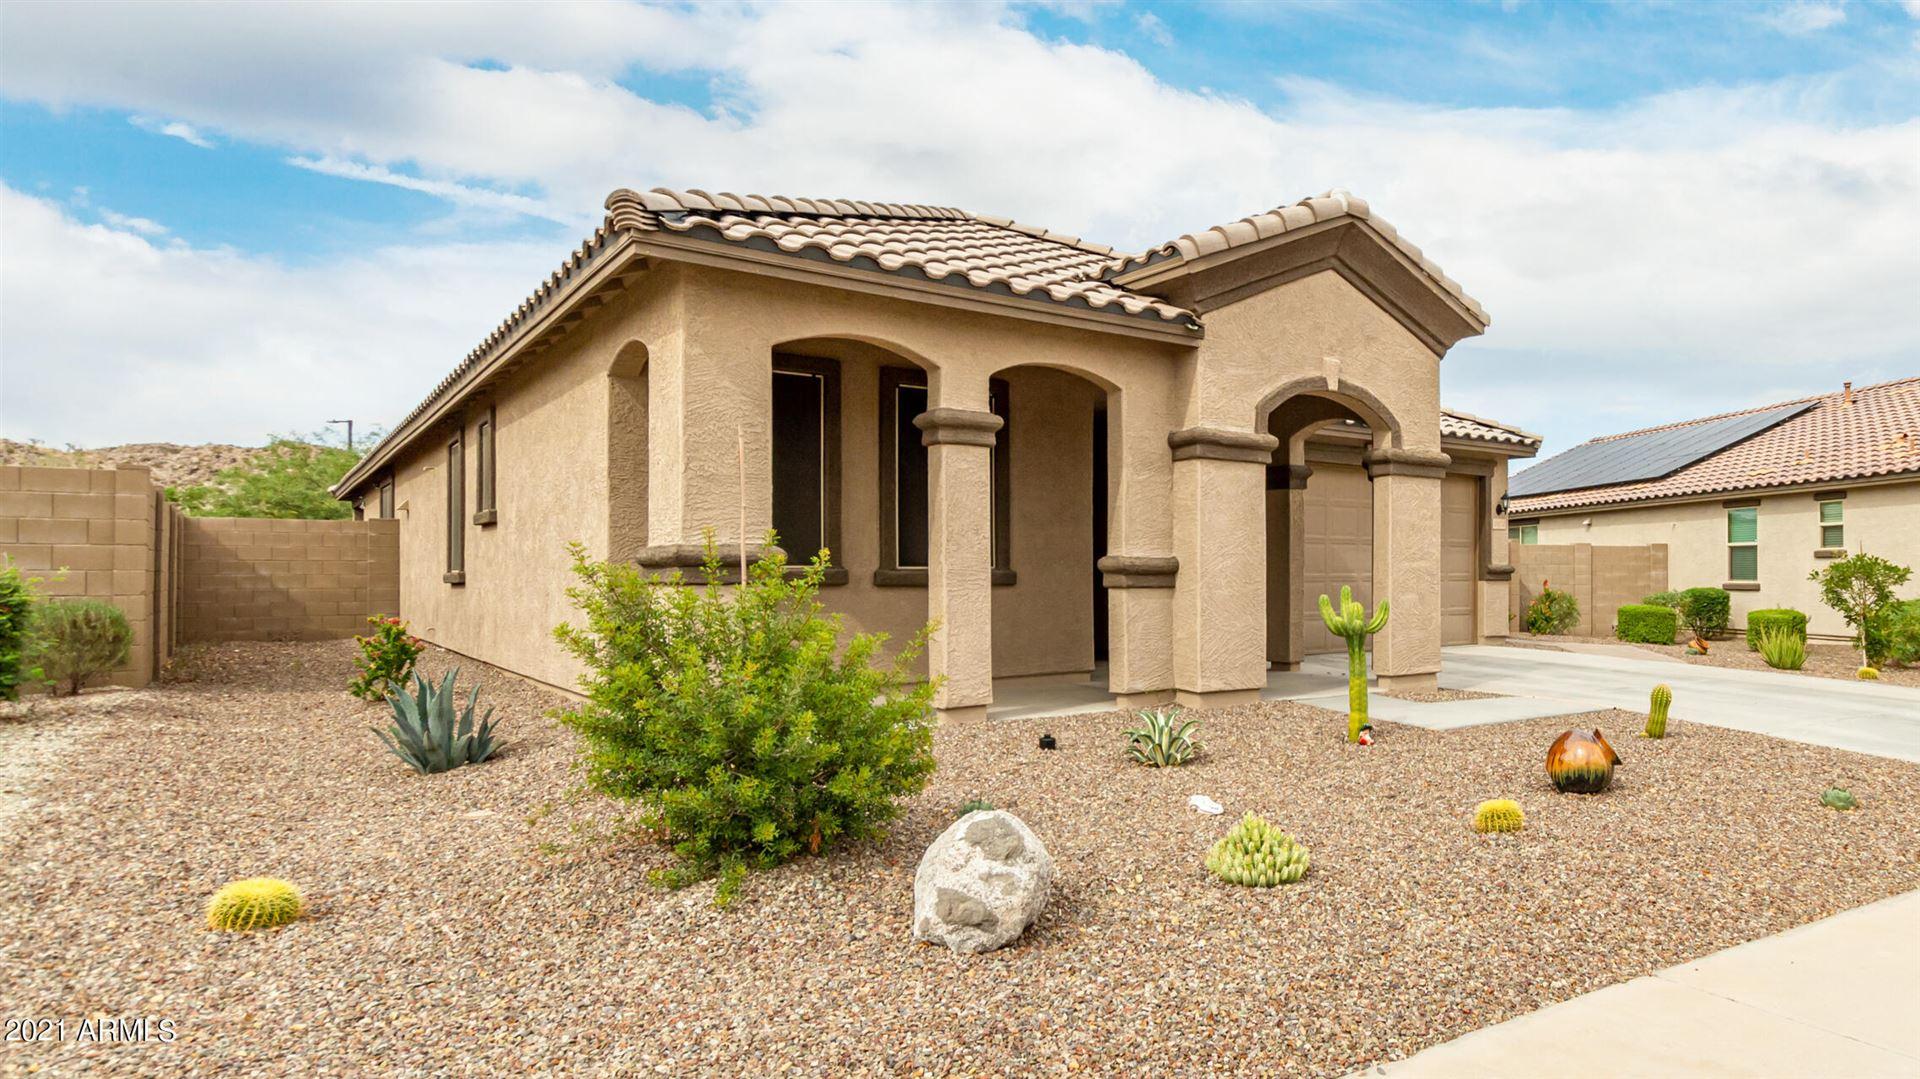 Photo of 18174 W THISTLE LANDING Drive, Goodyear, AZ 85338 (MLS # 6307111)